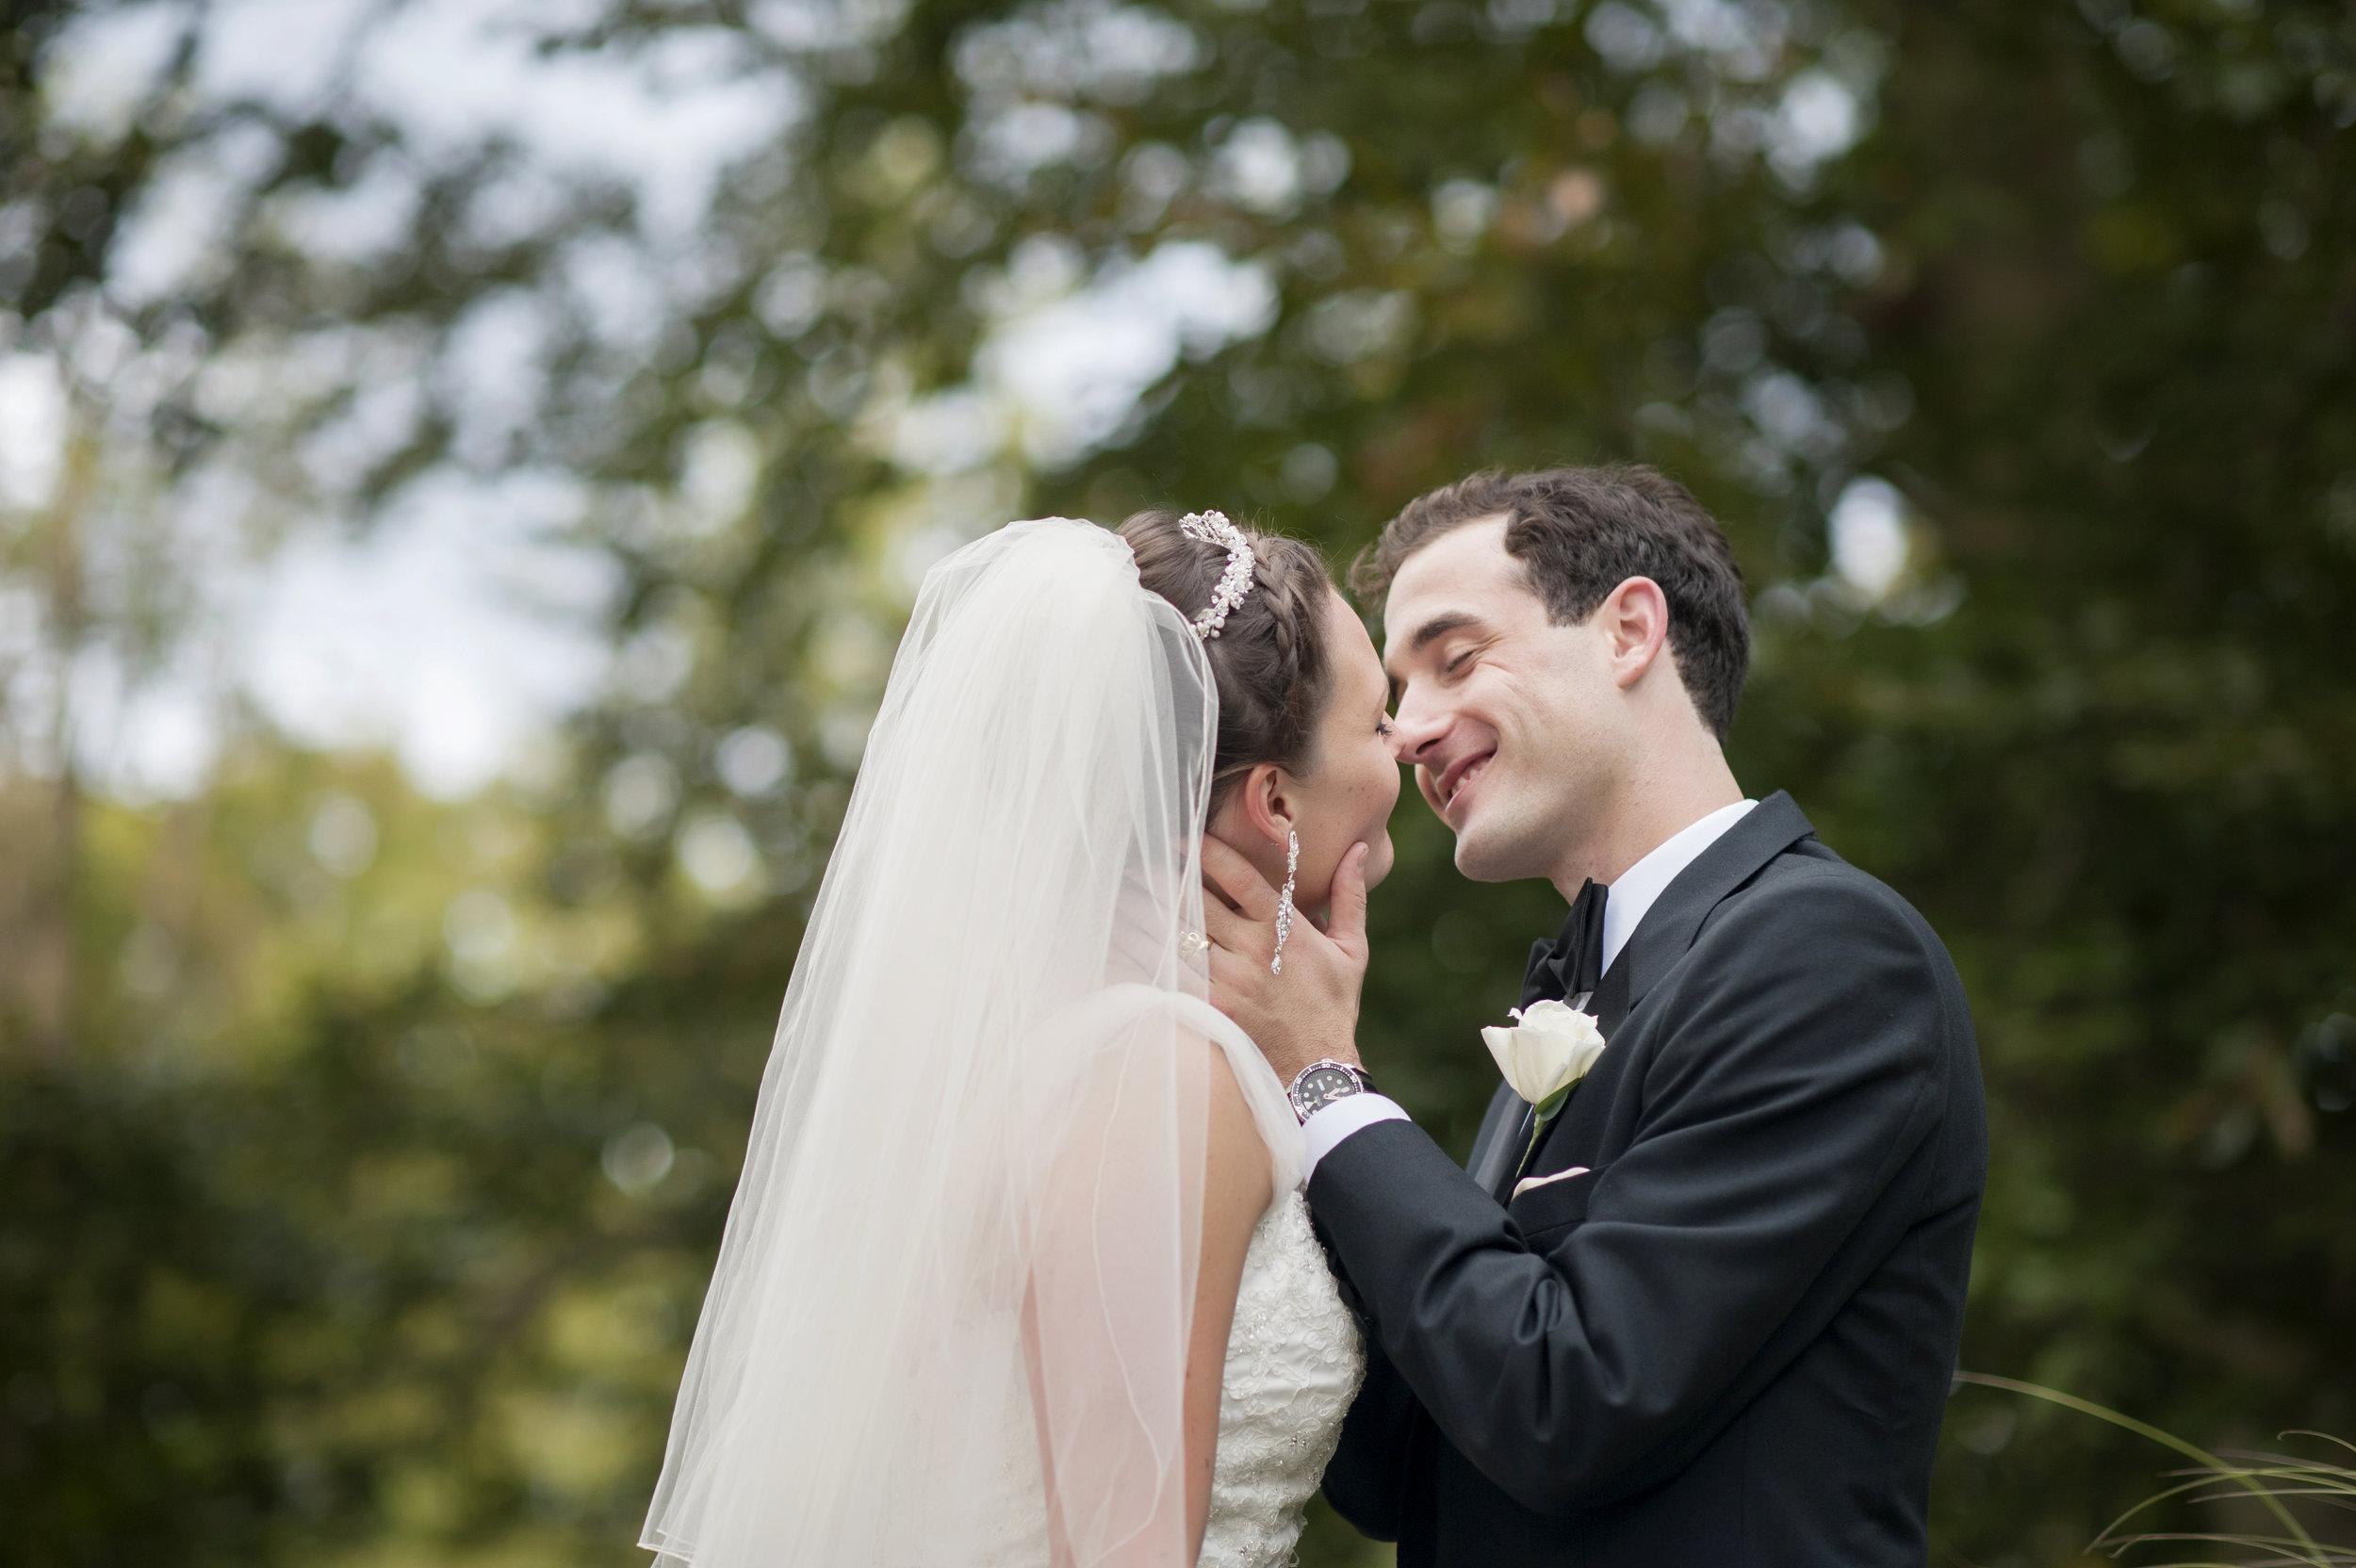 JAlviti_Photography_Weddings_Engagement_Proposal003.jpg